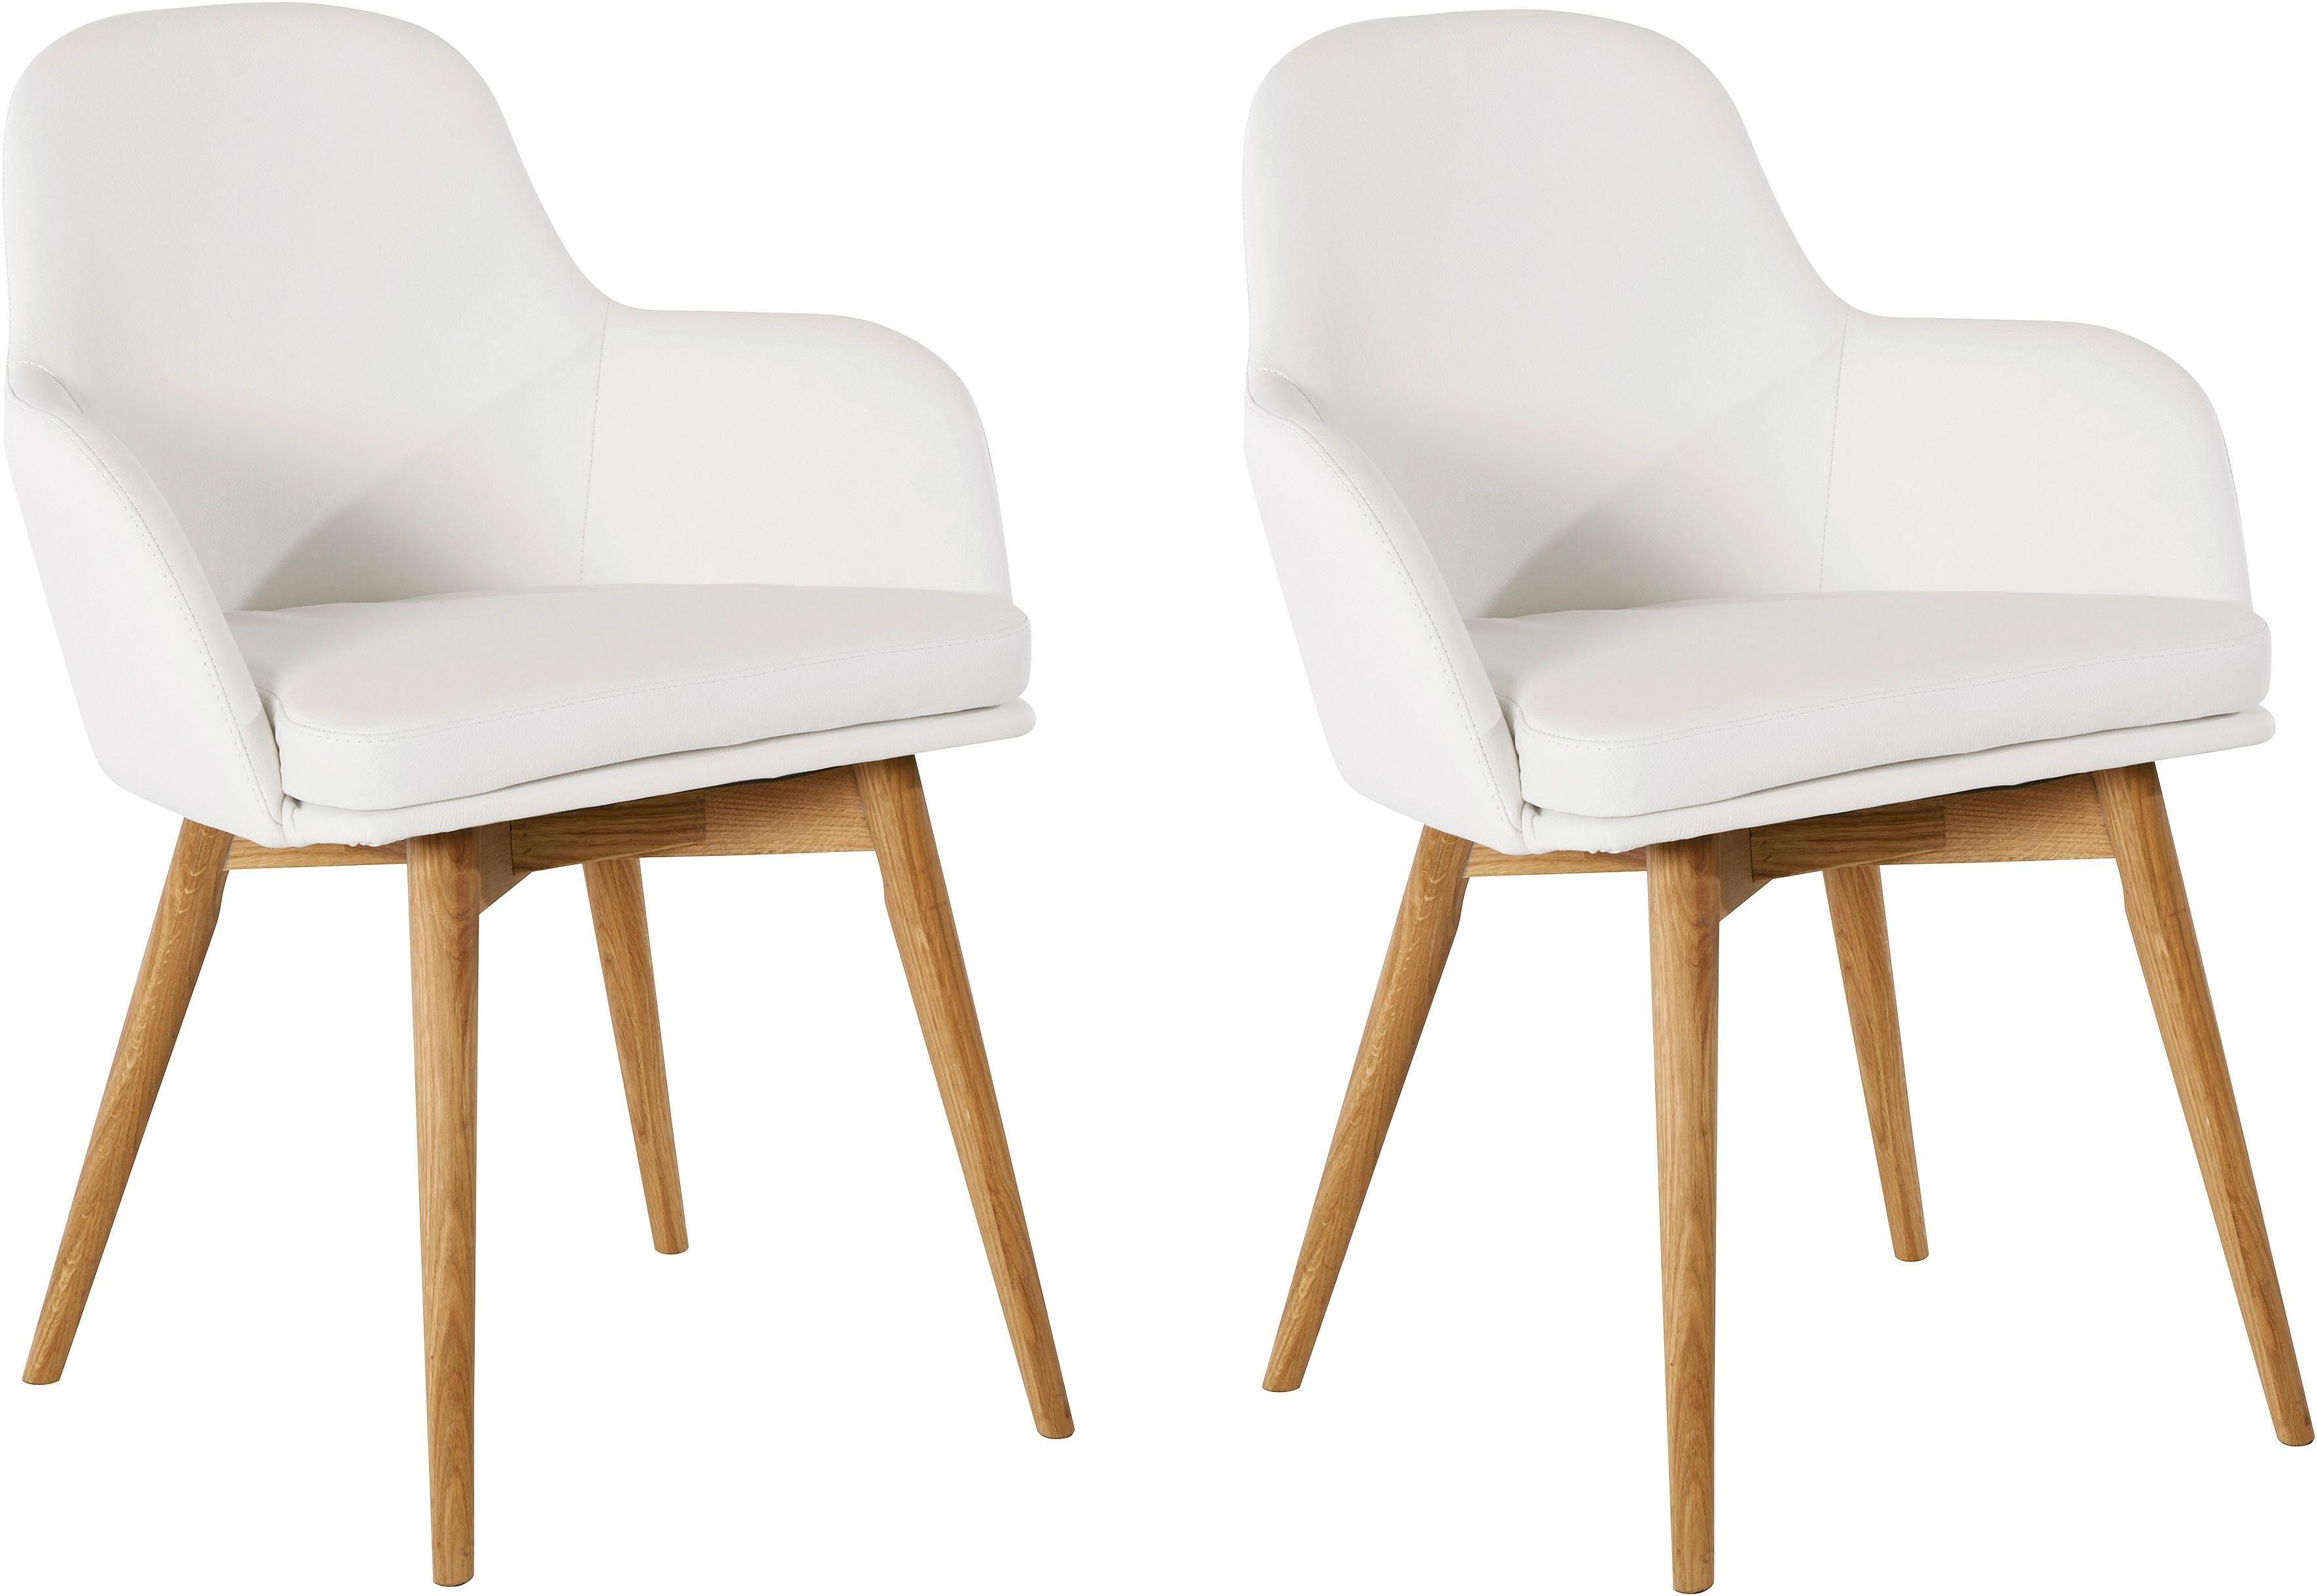 "WOHNIDEE-Kollektion Armlehnstuhl ""Malva"" Wohnen/Möbel/Stühle & Sitzbänke/Holzstühle"